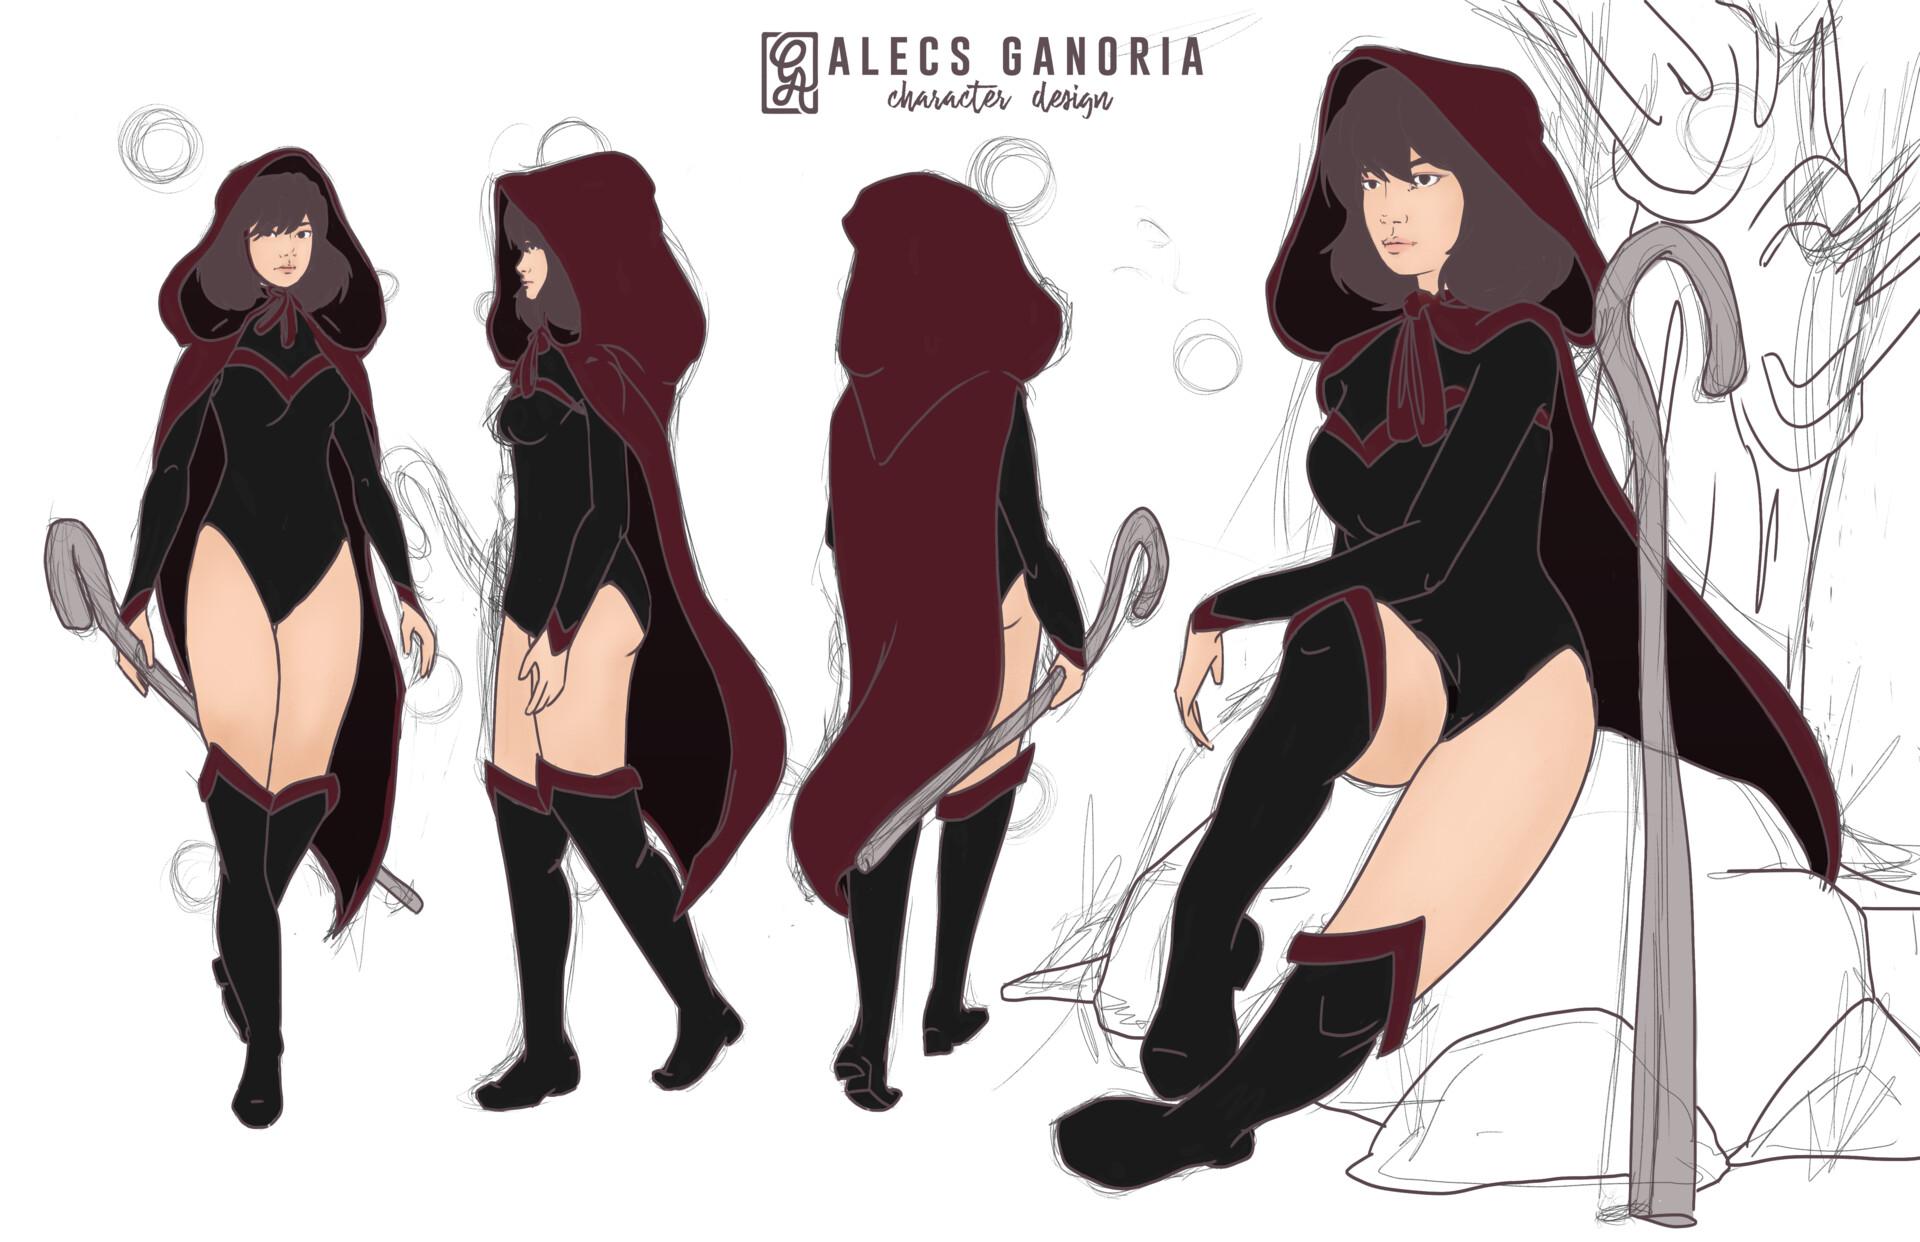 Alecs ganoria character final 7